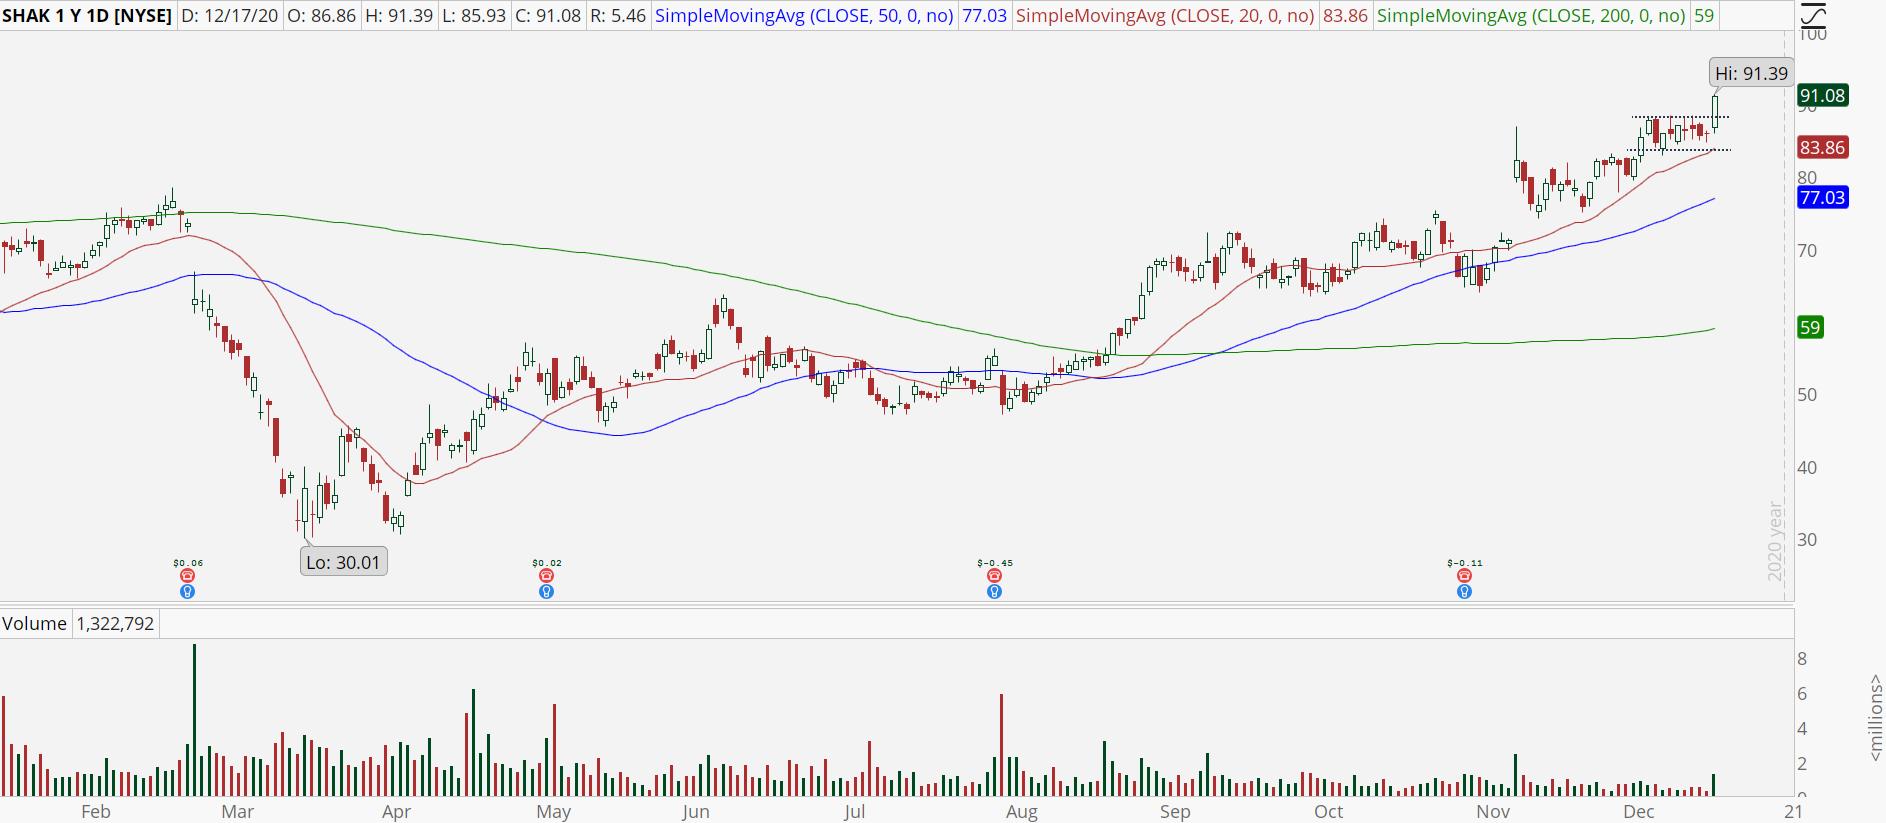 Shake Shak (SHAK) stock chart with bull breakout